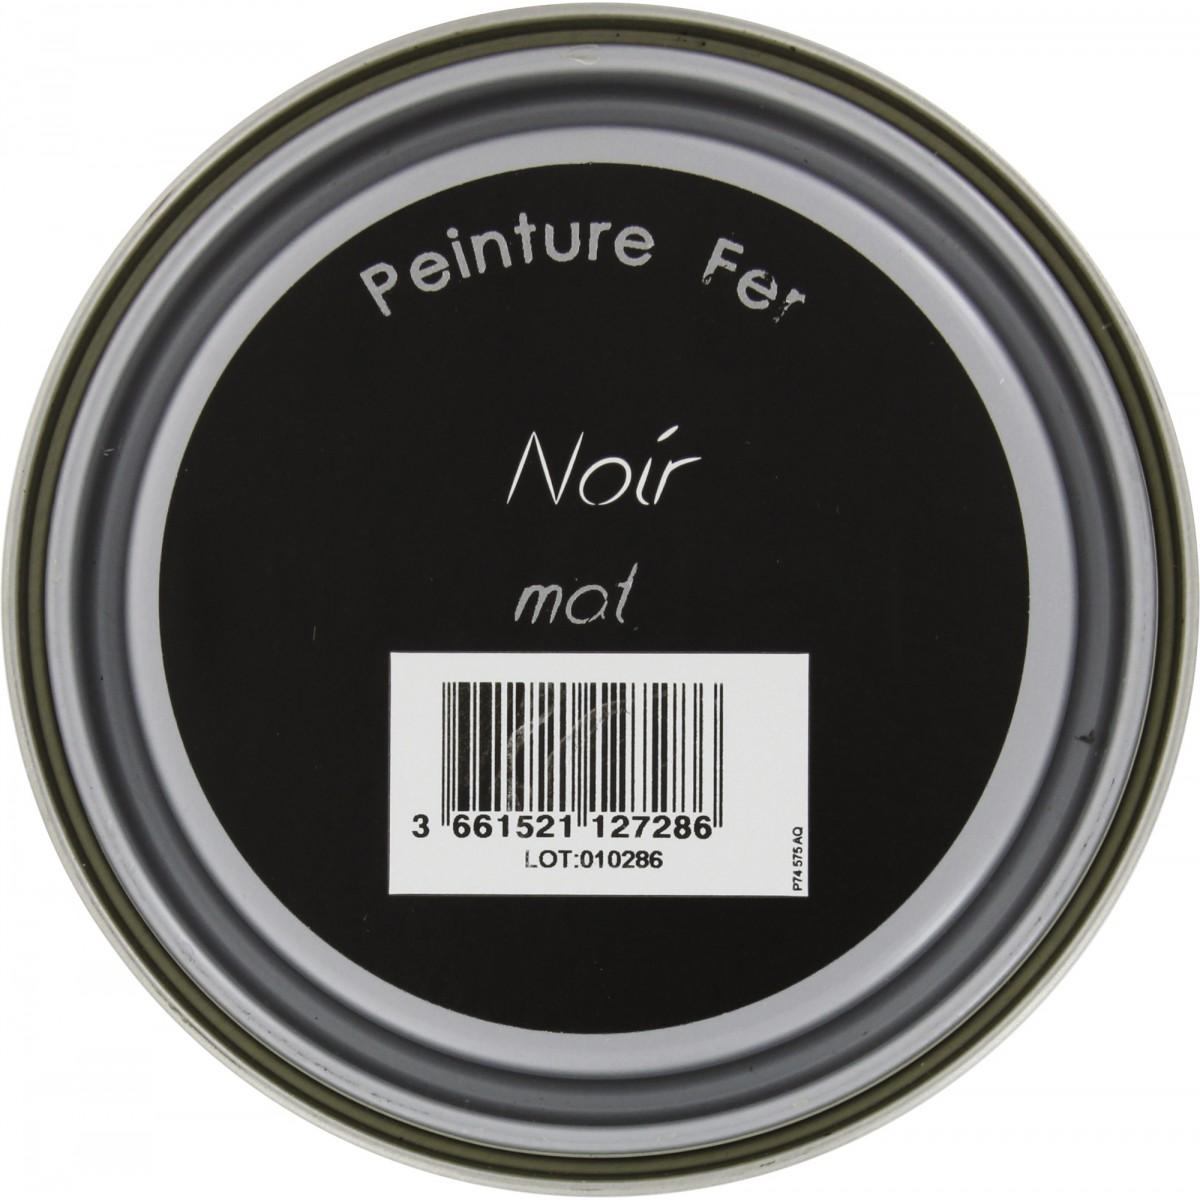 Peinture fer Addict - 0,5 l - Noir mat